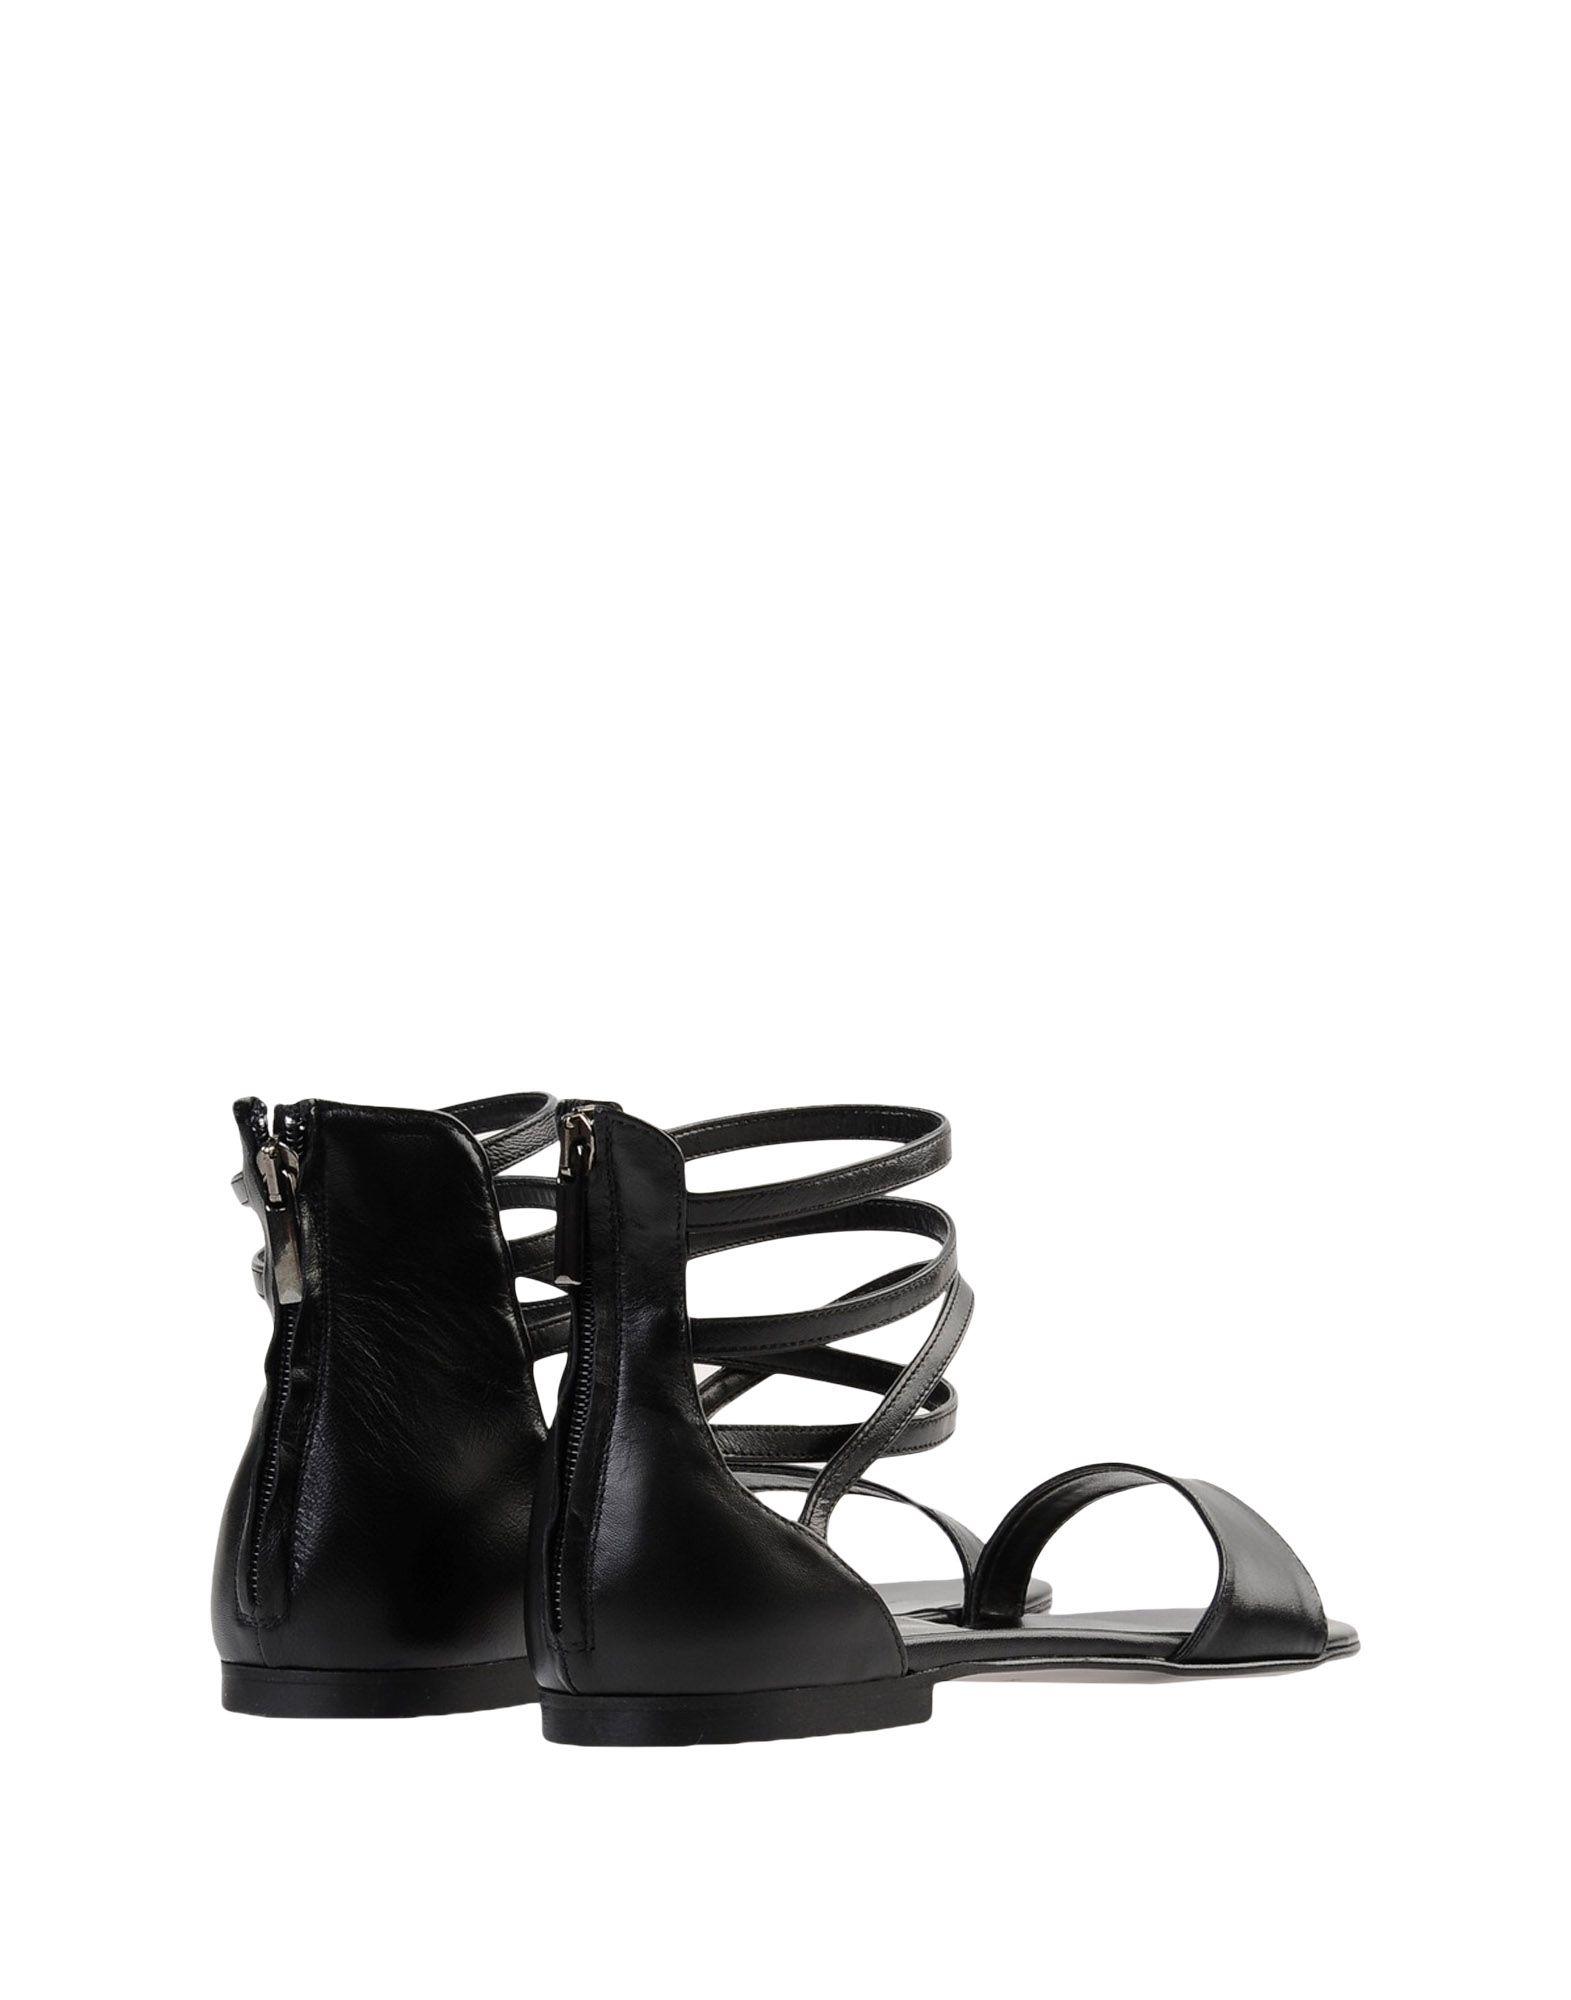 Jolie By Edward Spiers Sandalen Damen  11477741CR Gute Qualität beliebte Schuhe